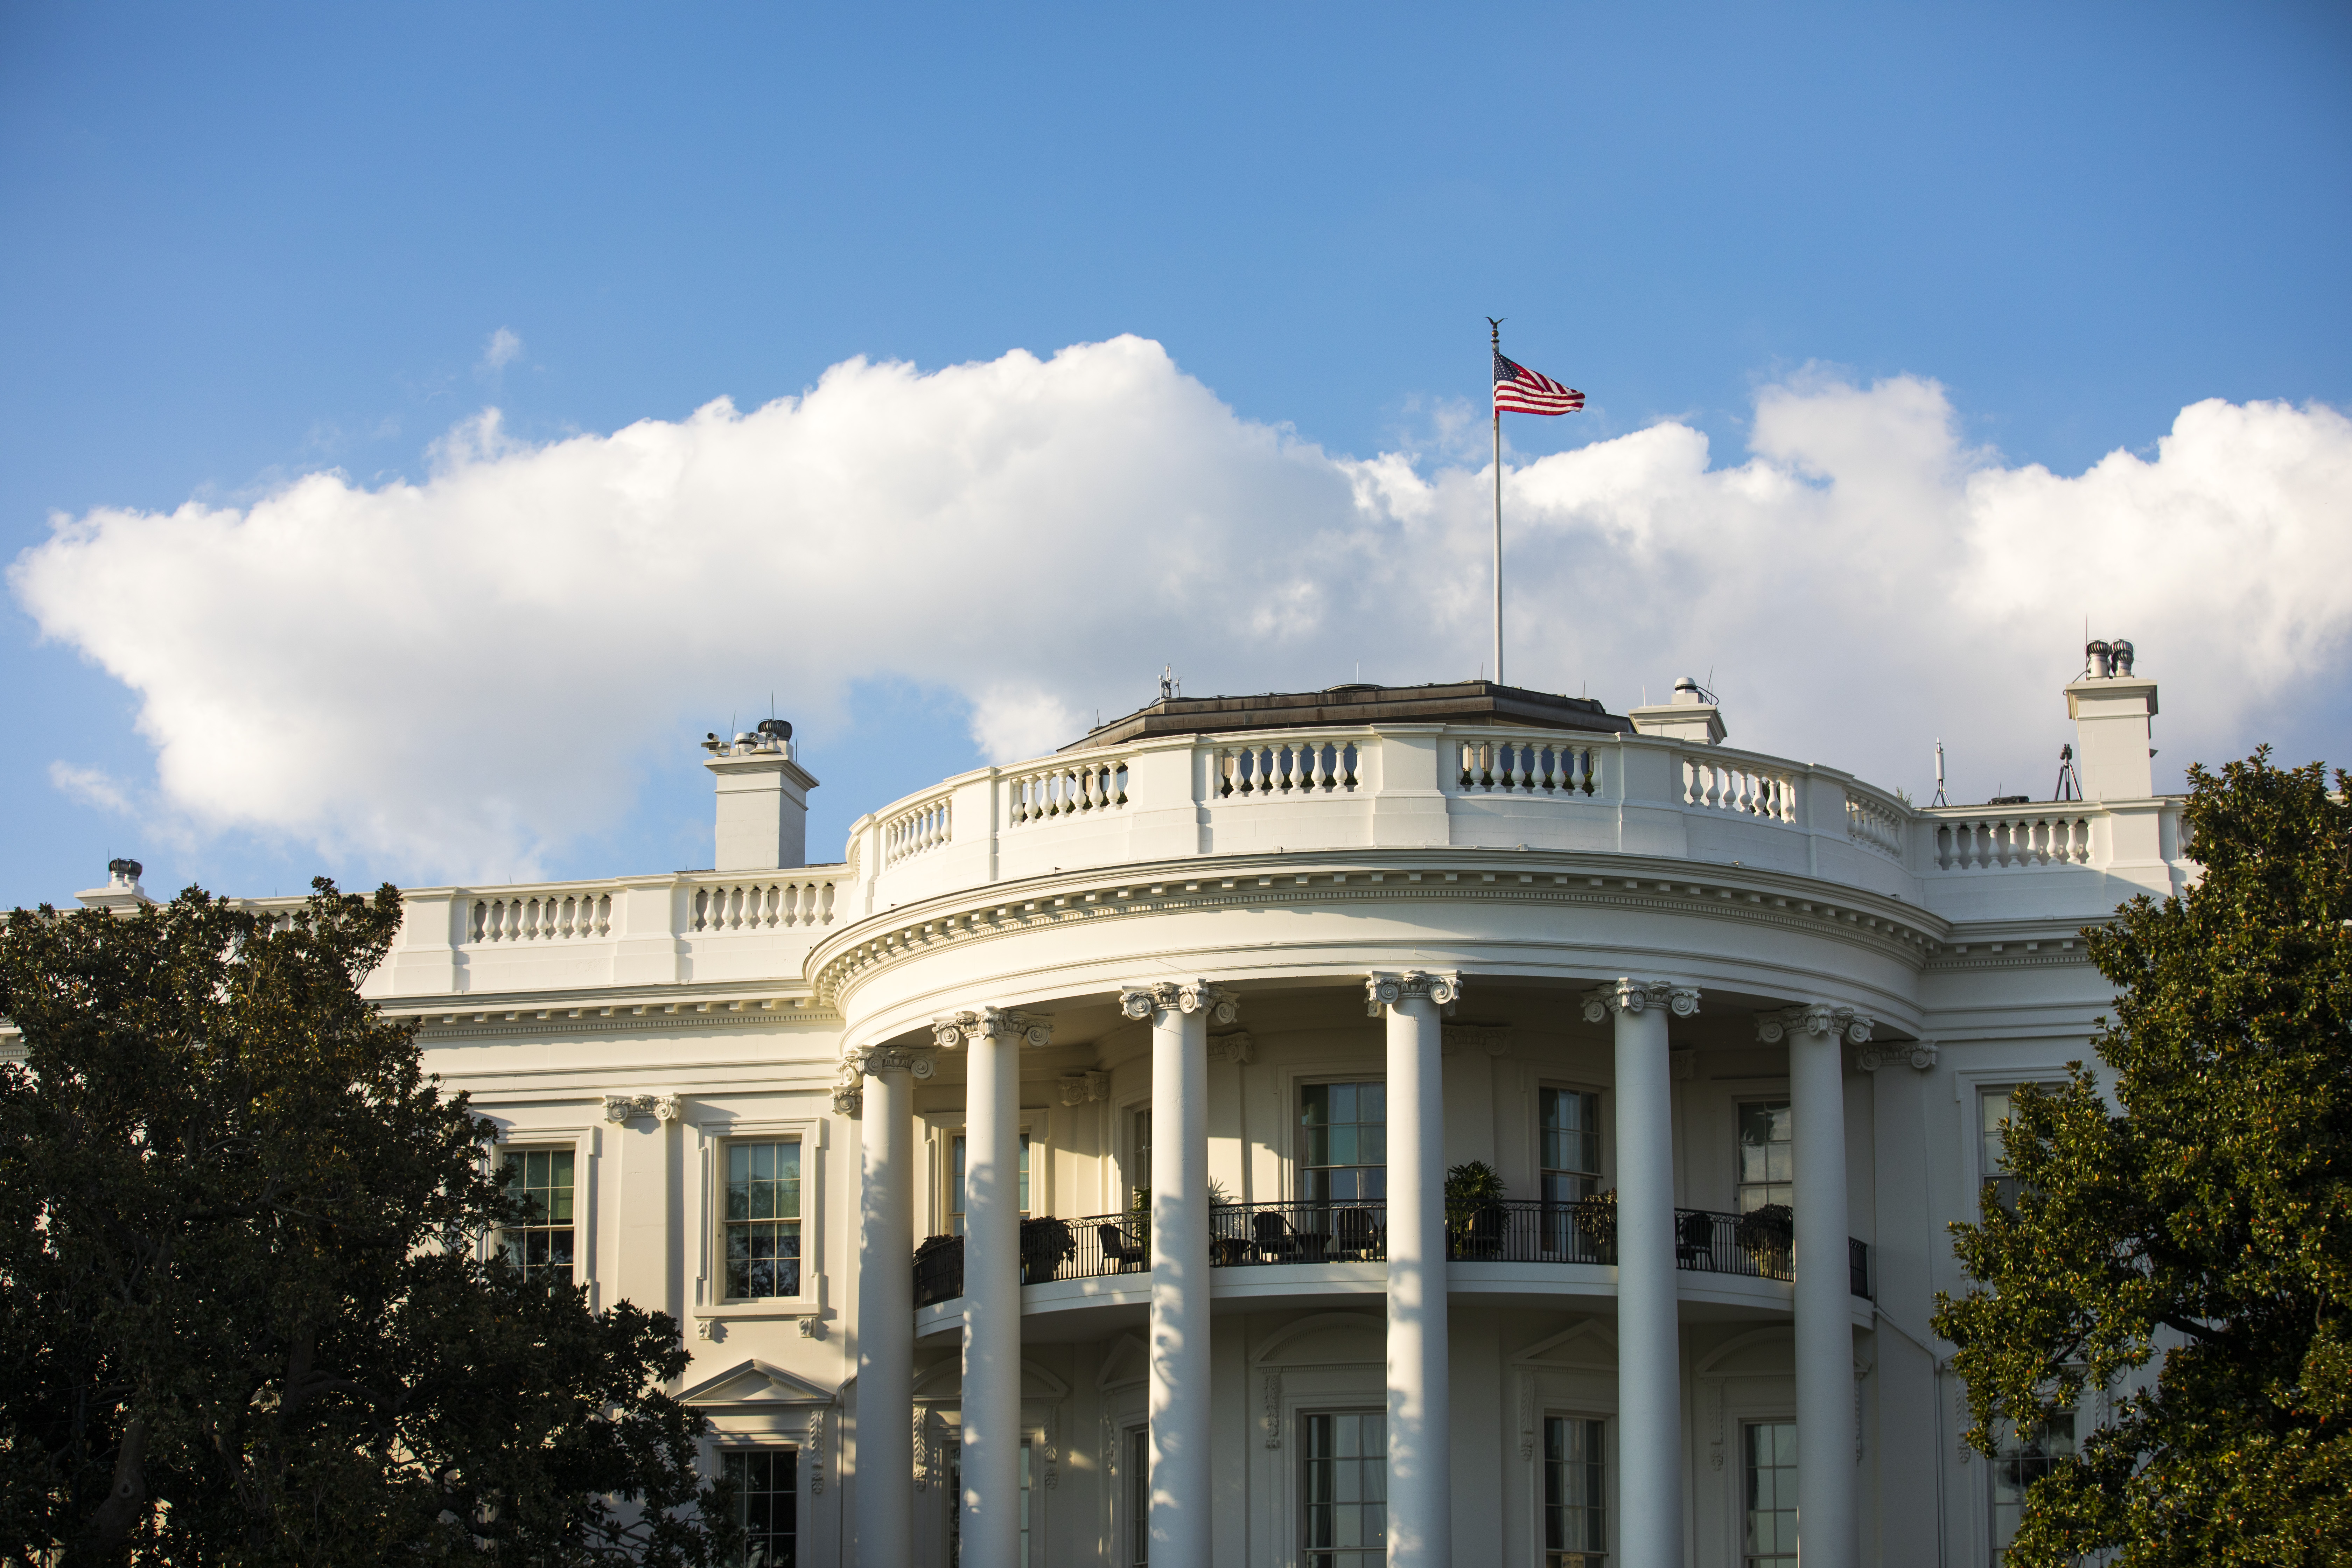 The south facade of the White House,  including the Truman Balcony,   October 3, 2016 in Washington, DC.